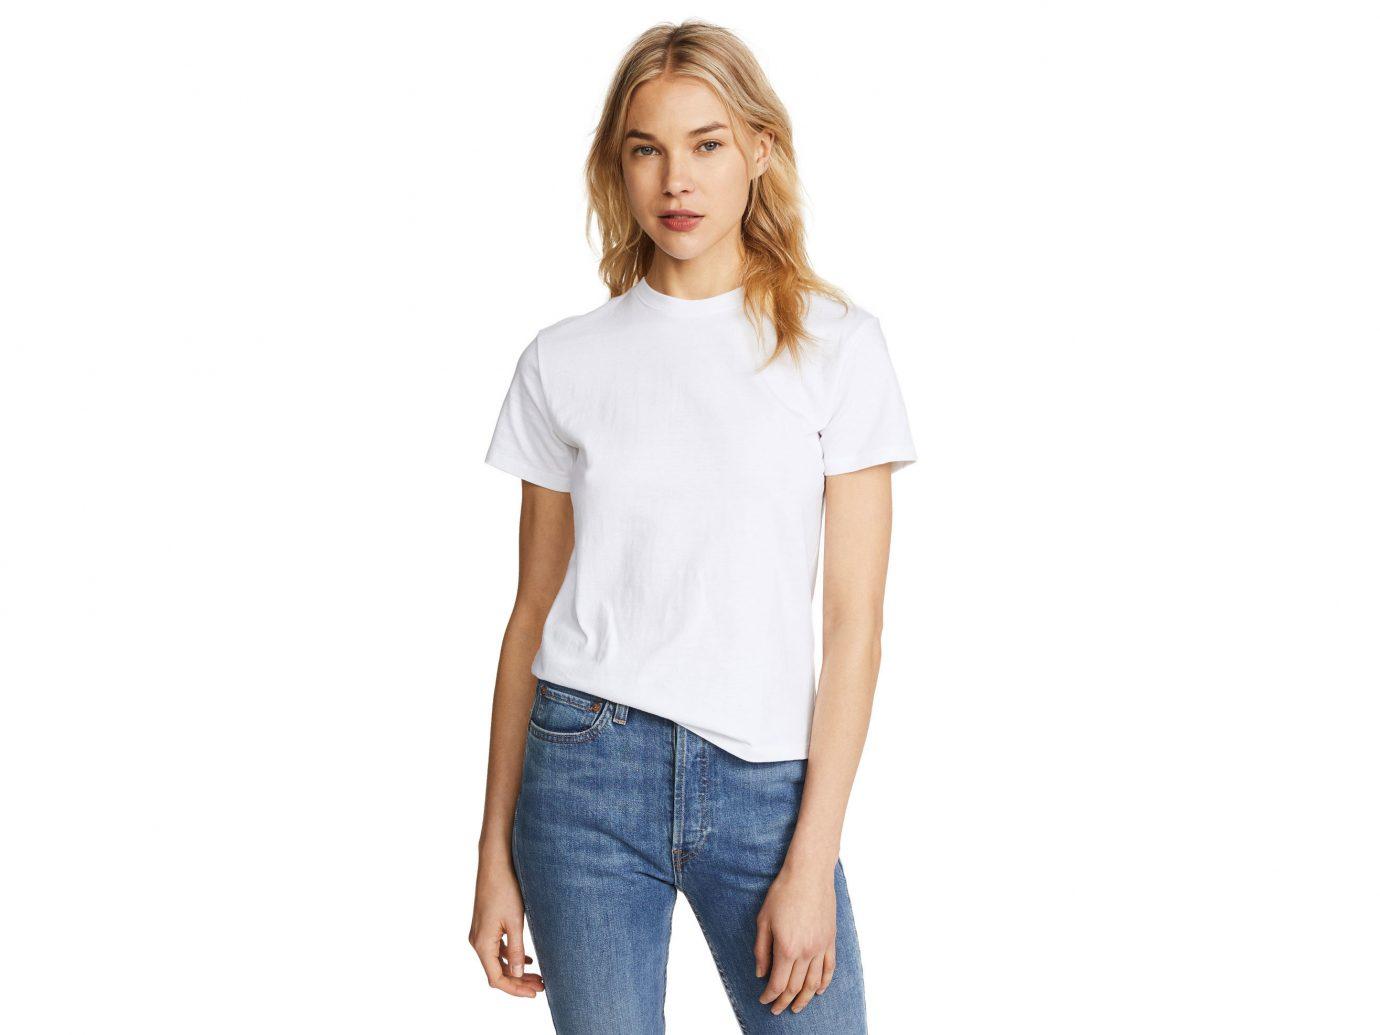 Celebs Style + Design Travel Shop person clothing white sleeve standing shoulder t shirt neck jeans pocket fashion model joint denim posing trouser